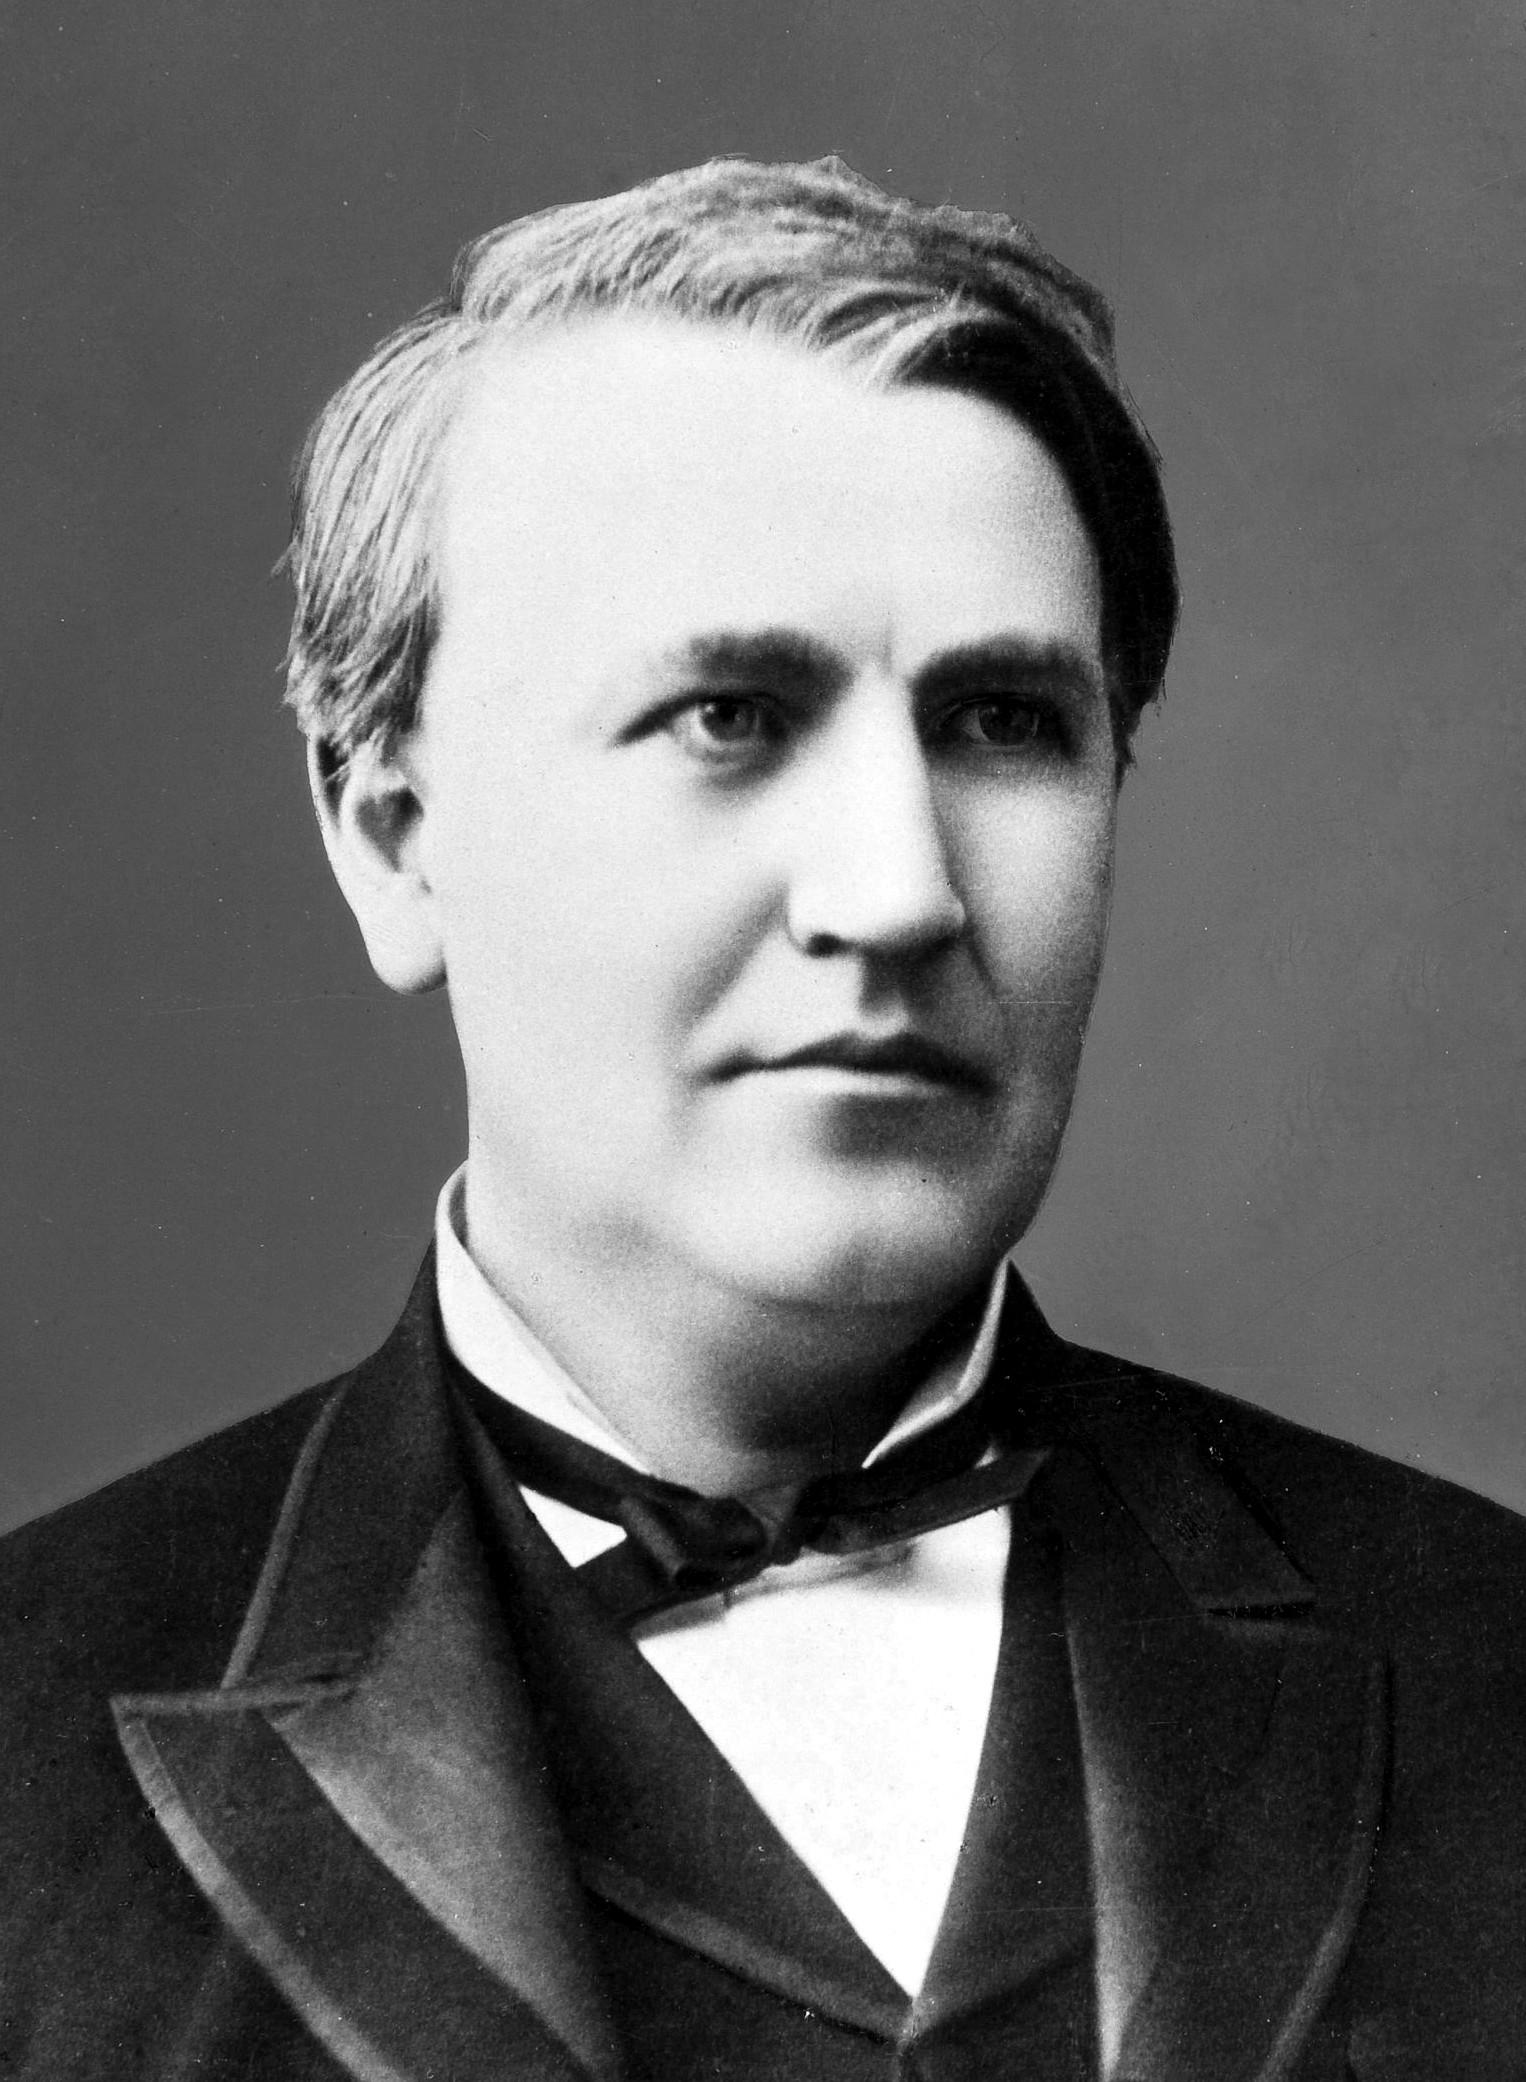 Thomas Edison - Lessons - Tes Teach for thomas edison in color  588gtk